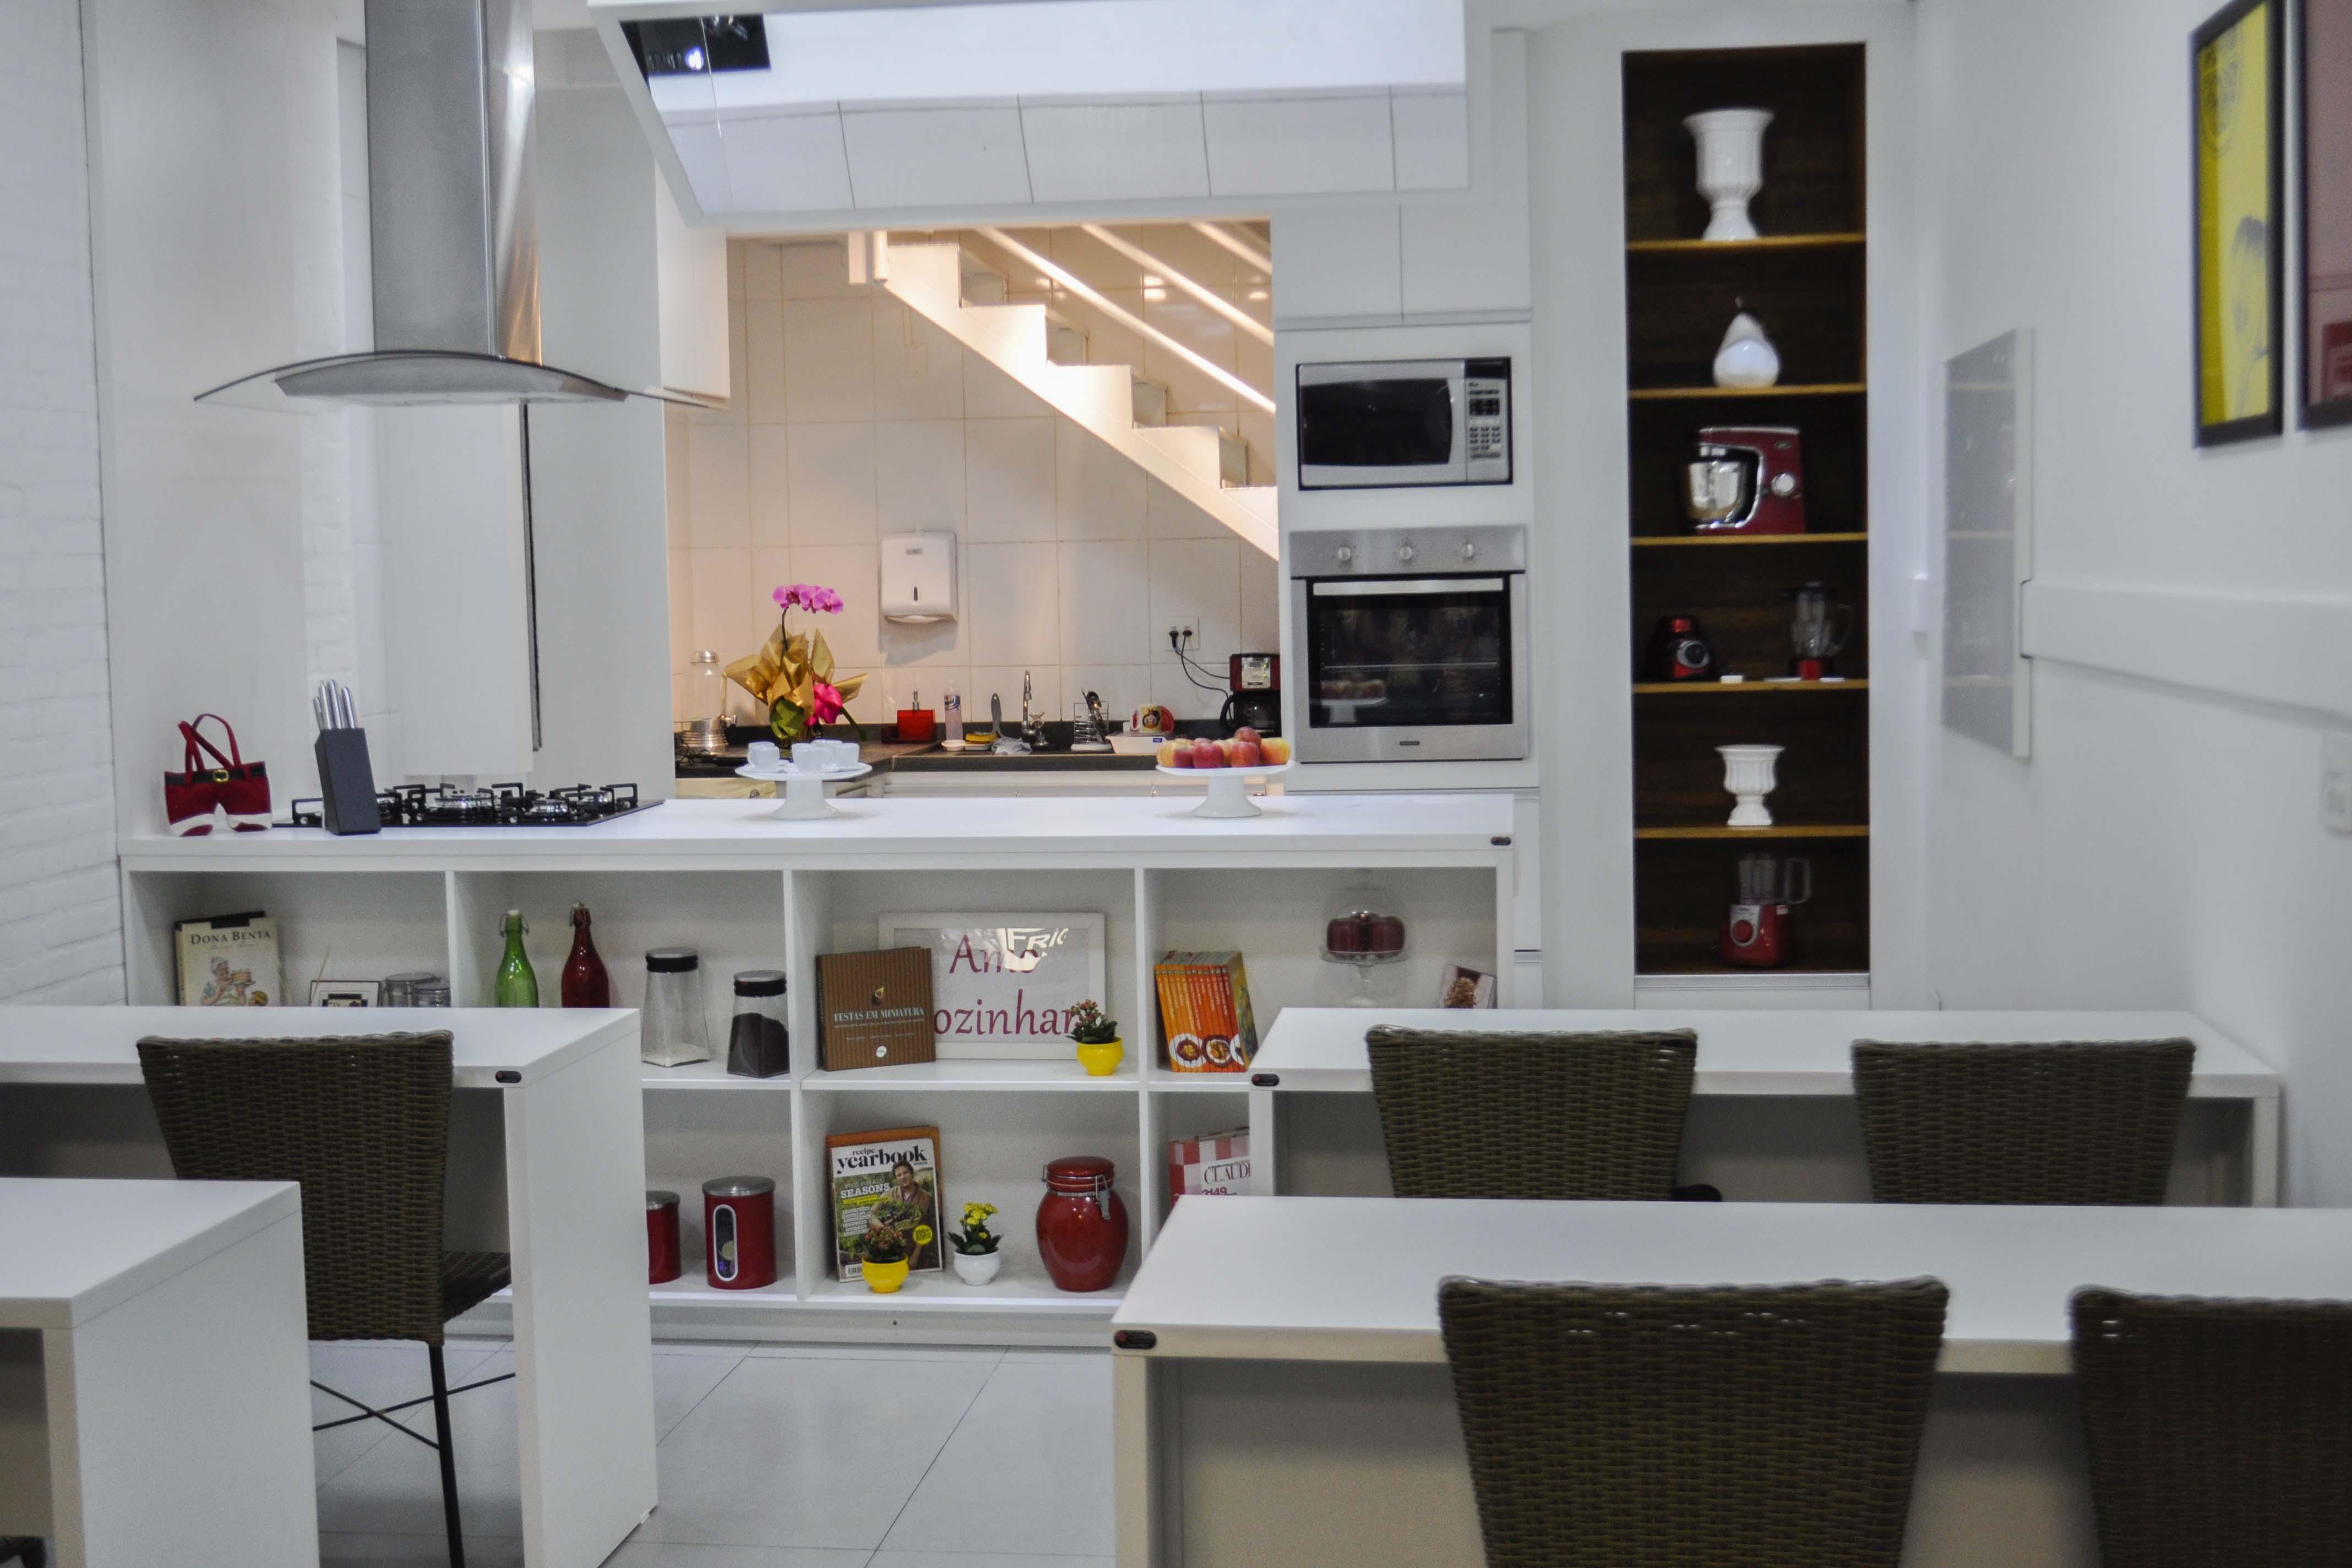 Cokitchen Cozinha Compartilhada A Nova Proposta De Duas